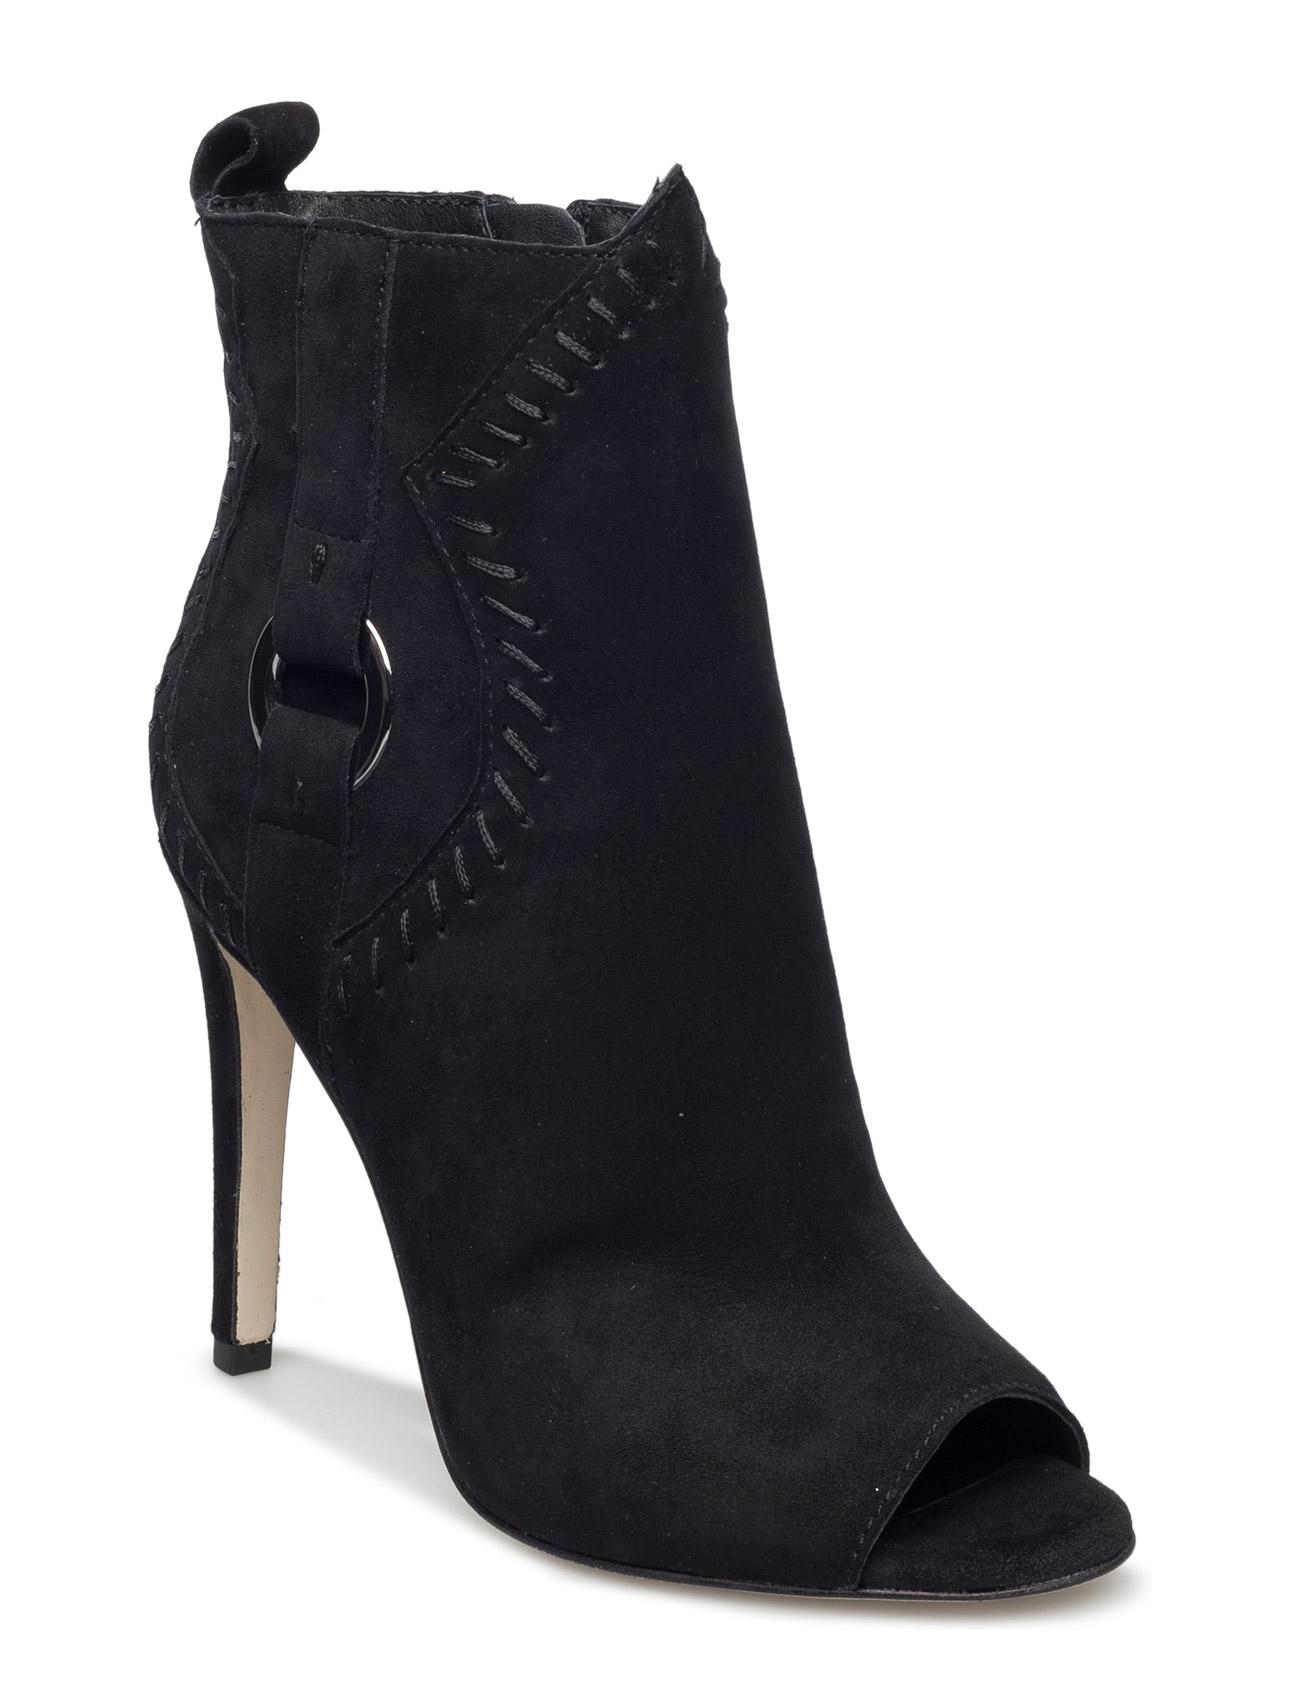 Ridley Rebecca Minkoff Støvler til Damer i Sort